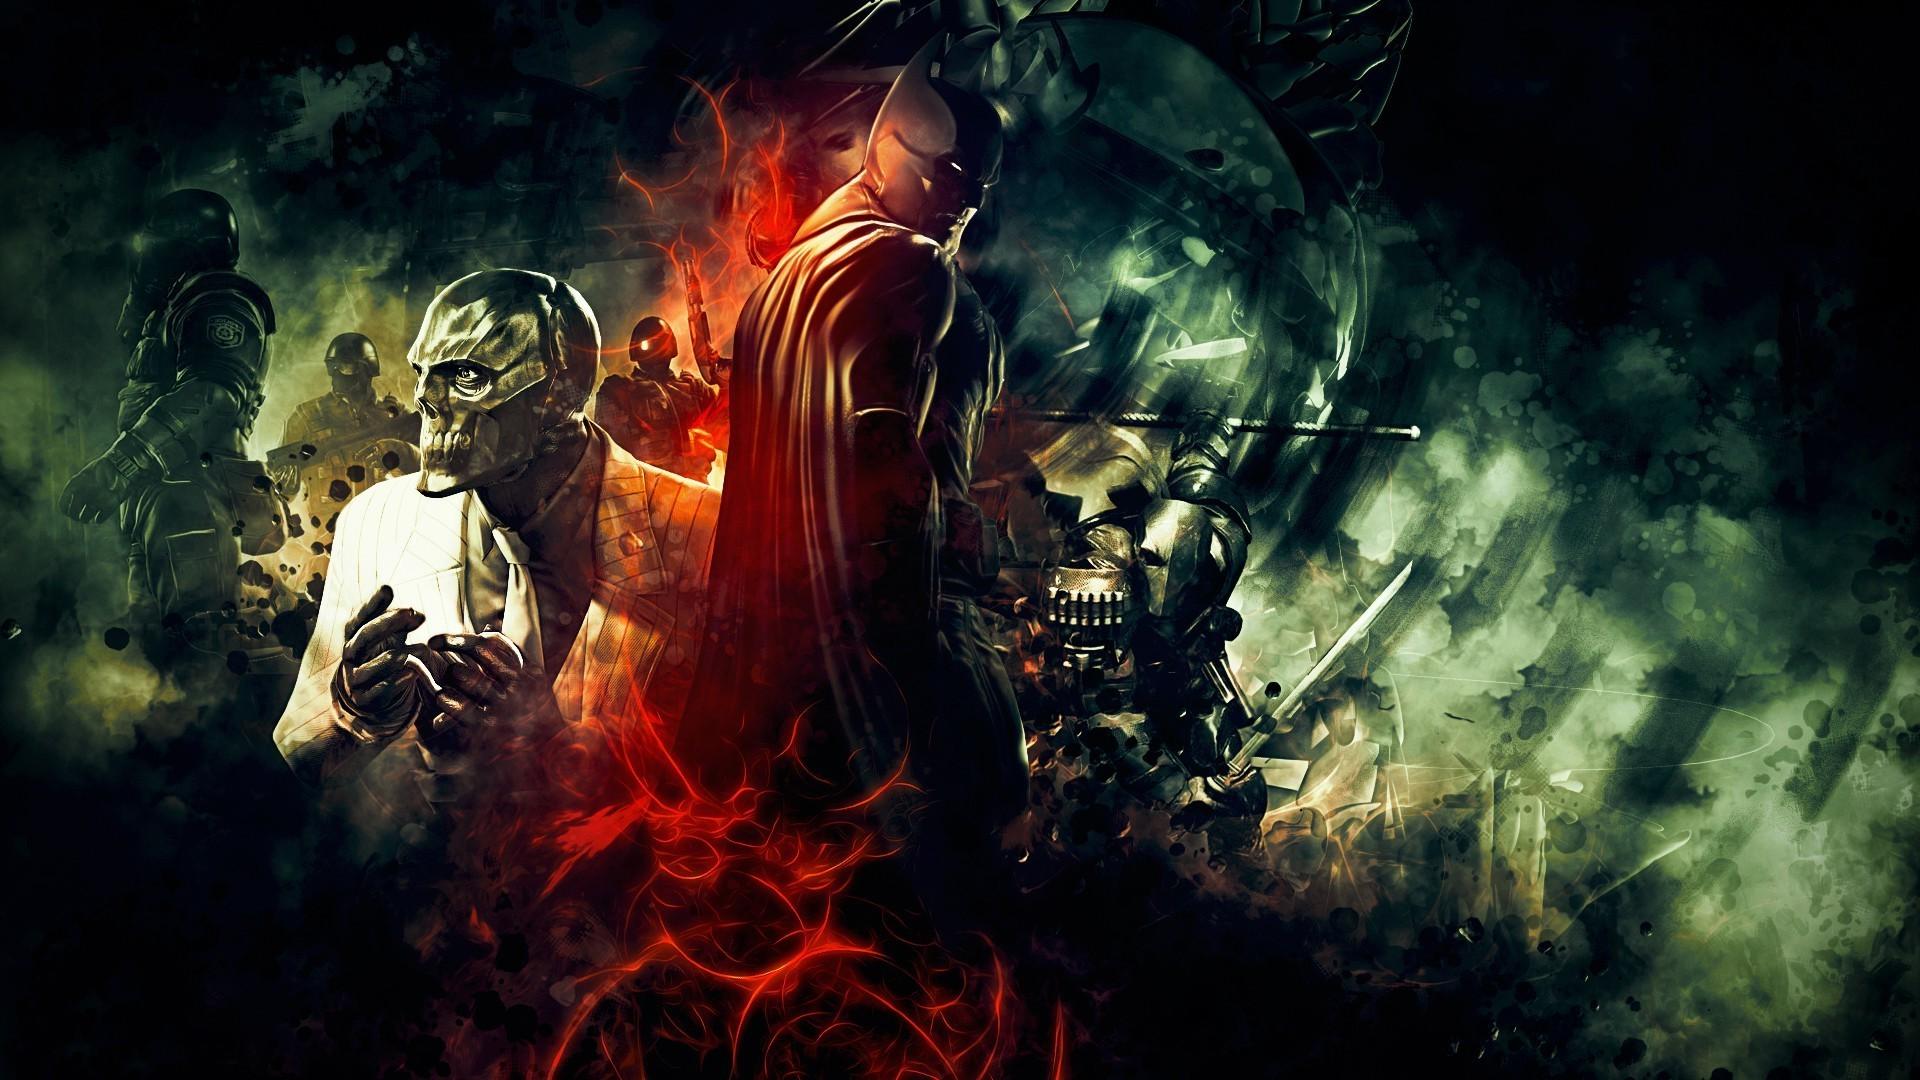 video Games, Batman: Arkham Origins, Batman, Black Mask, Deathstroke  Wallpapers HD / Desktop and Mobile Backgrounds